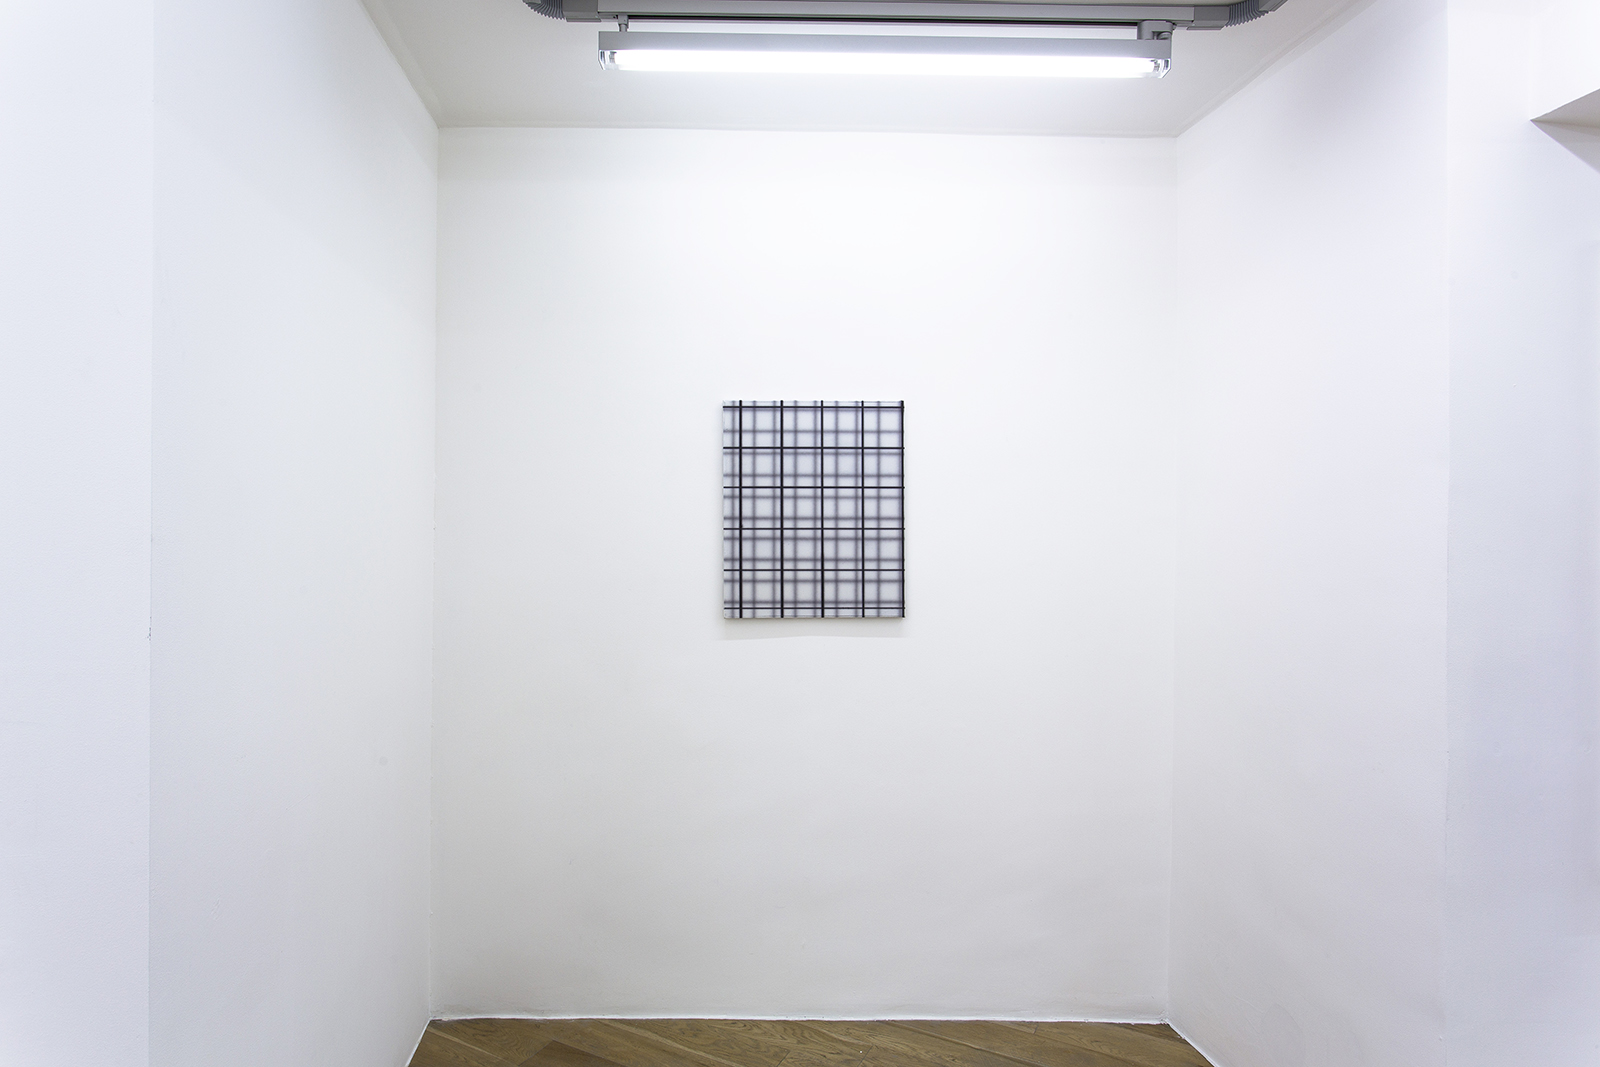 Thomas Baumann Untitled, 2014-2015 acrylic on canvas 60 x 50 cm